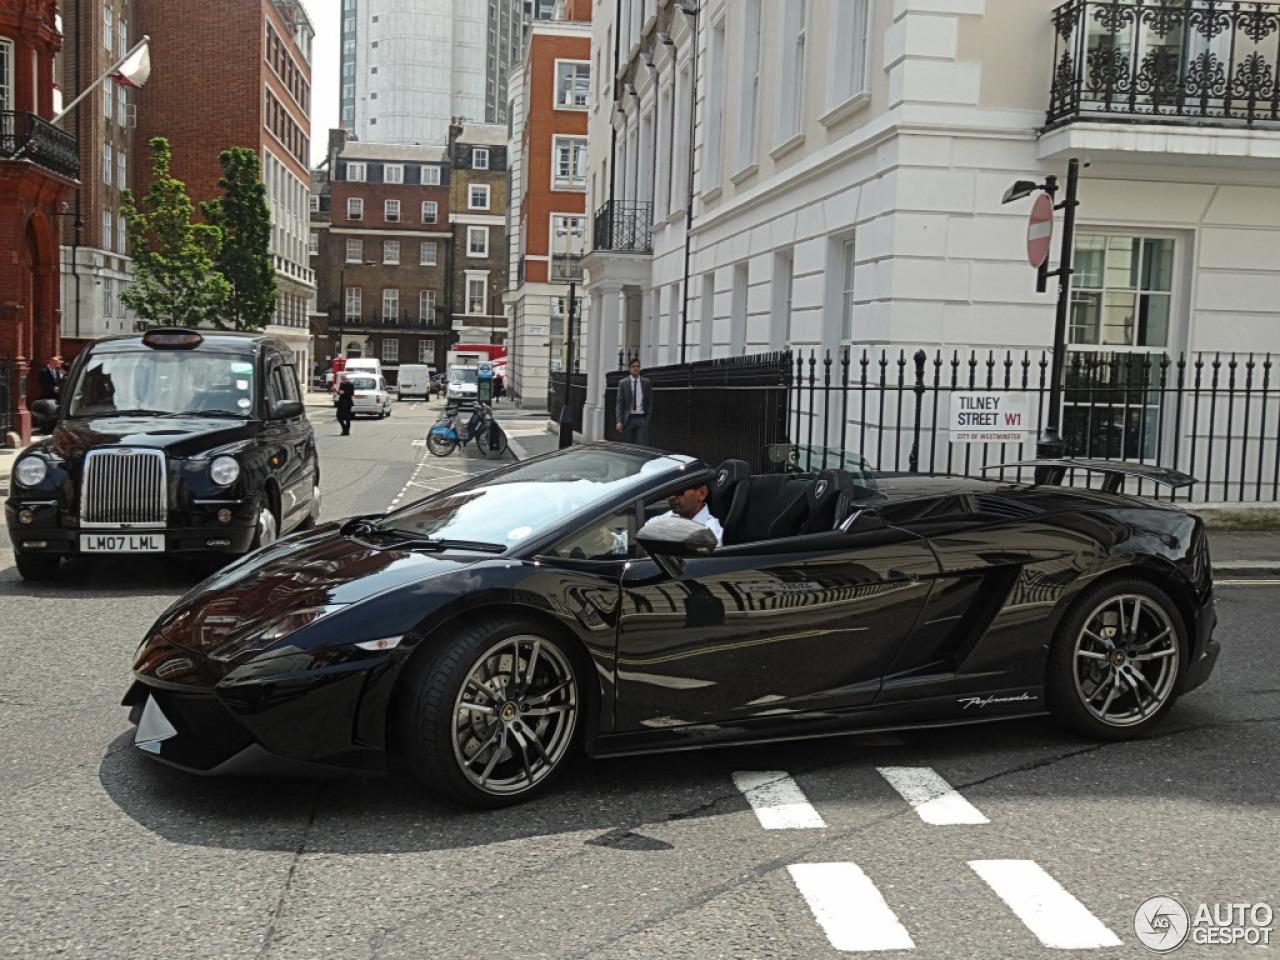 9 i lamborghini gallardo lp570 4 spyder performante 9 - Lamborghini Gallardo Spyder Black 2013